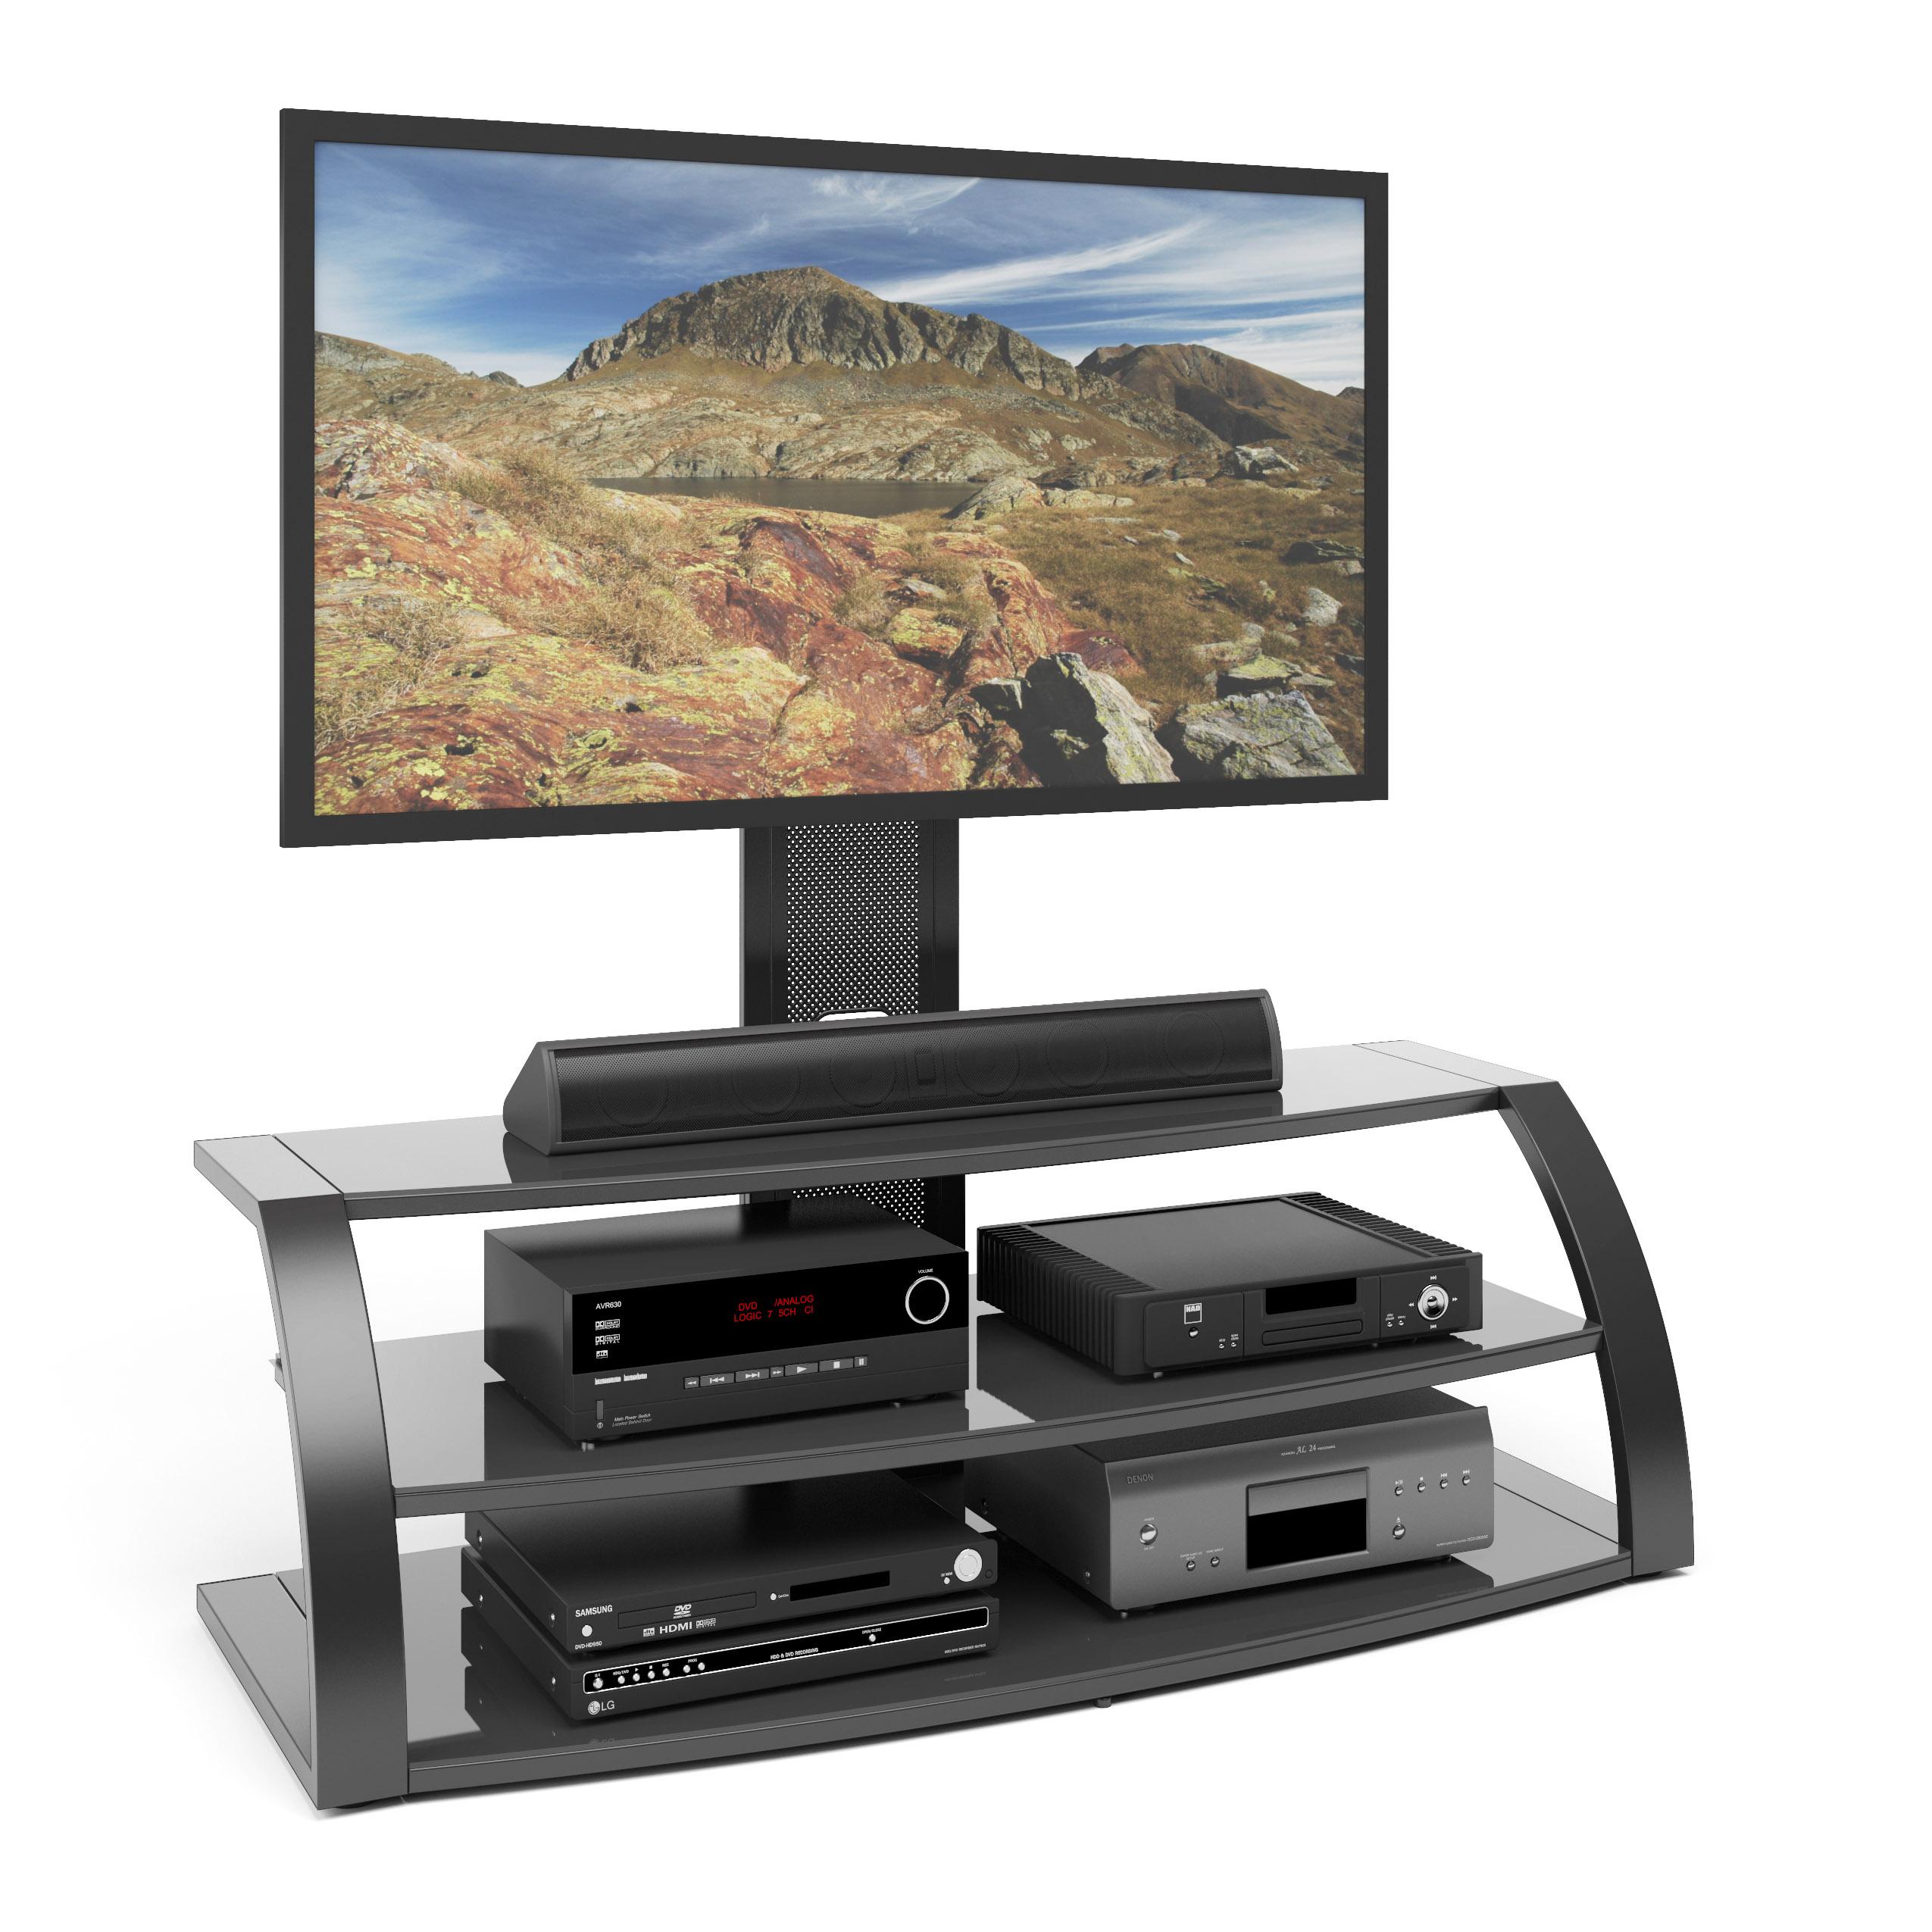 CorLiving Malibu TV Stand with Mount and Black Metal Uprights PartNumber: 00858150000P KsnValue: 6473521 MfgPartNumber: TML-506-T